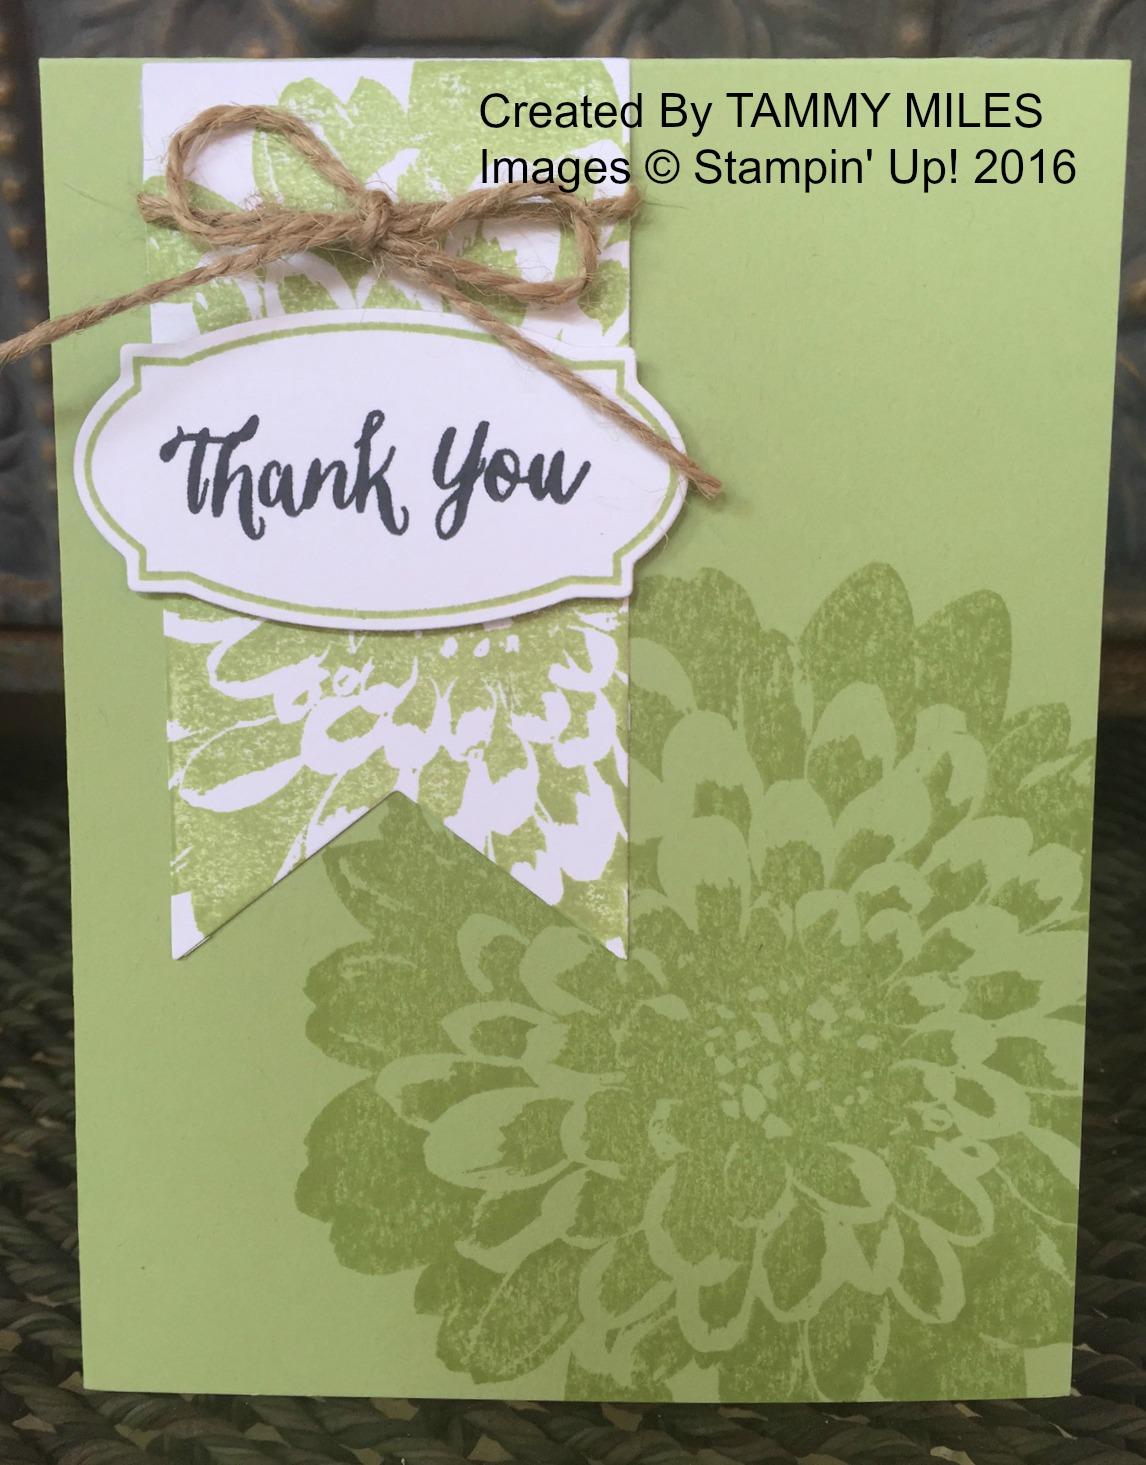 Tammy's Thank You card - www.stampedwithaloha.com